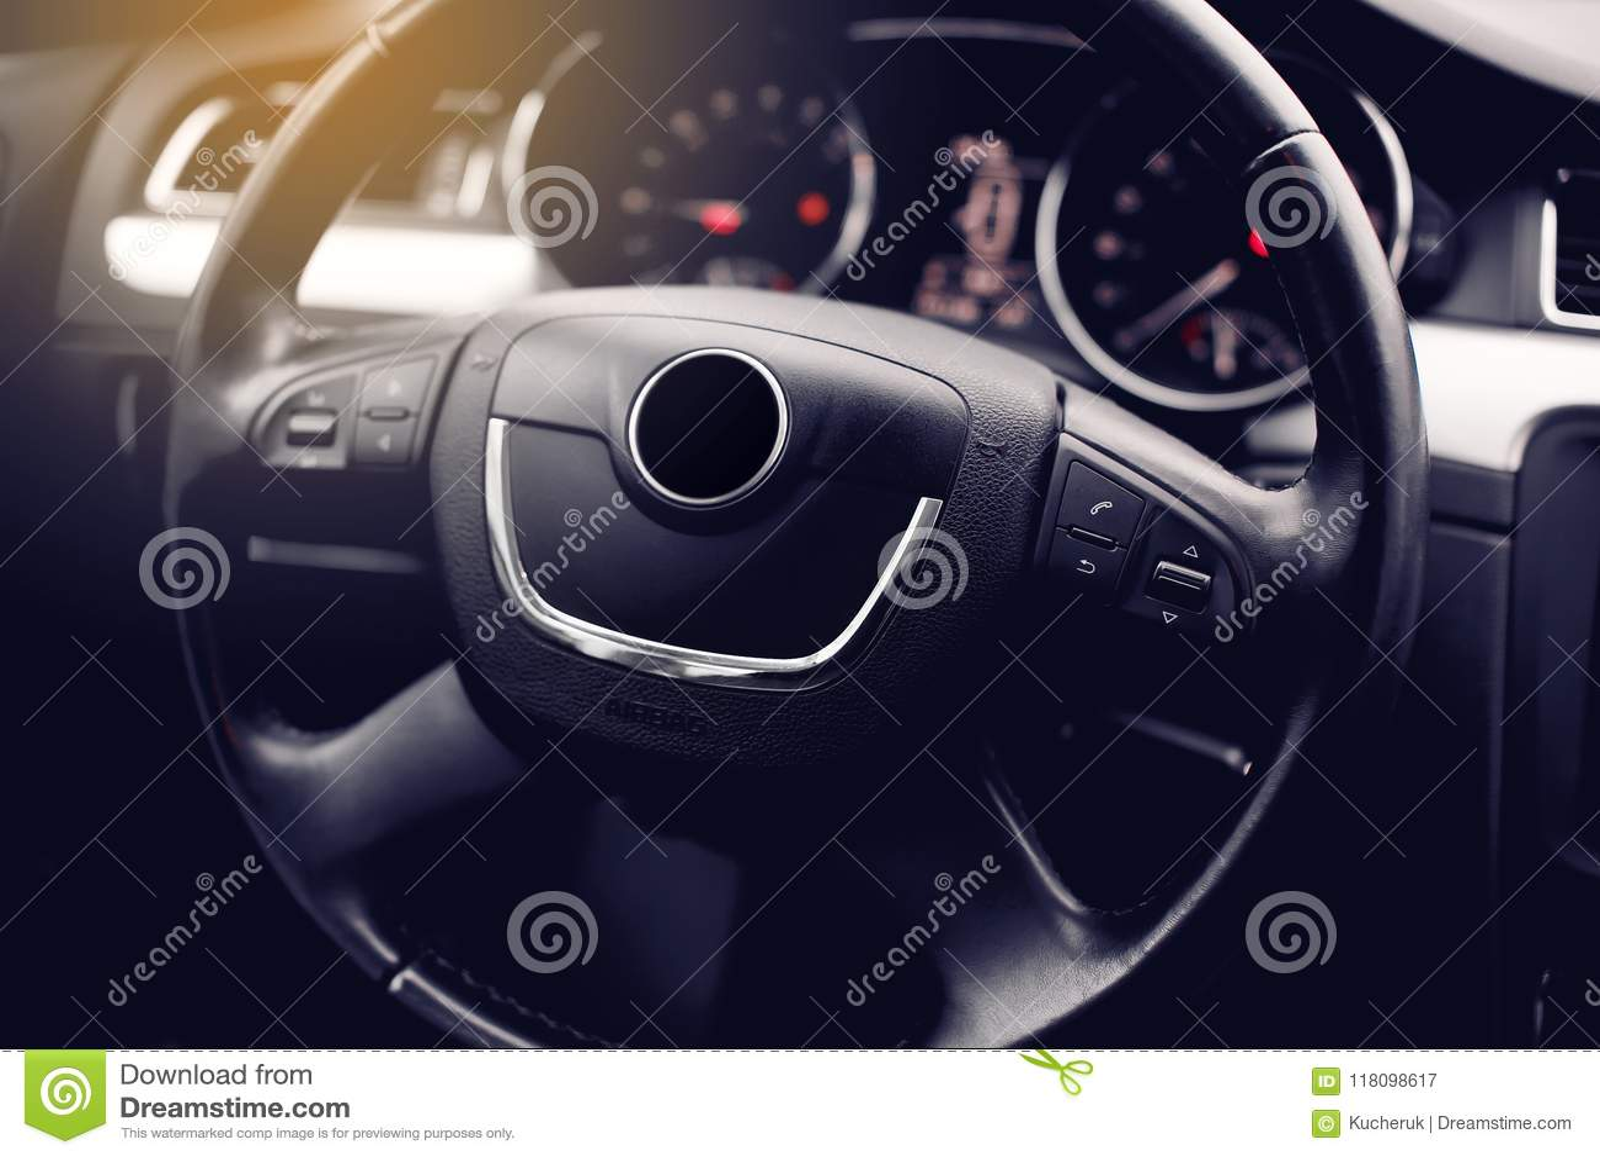 Interior moderno del coche Volante, tablero de instrumentos, velocímetro, exhibición